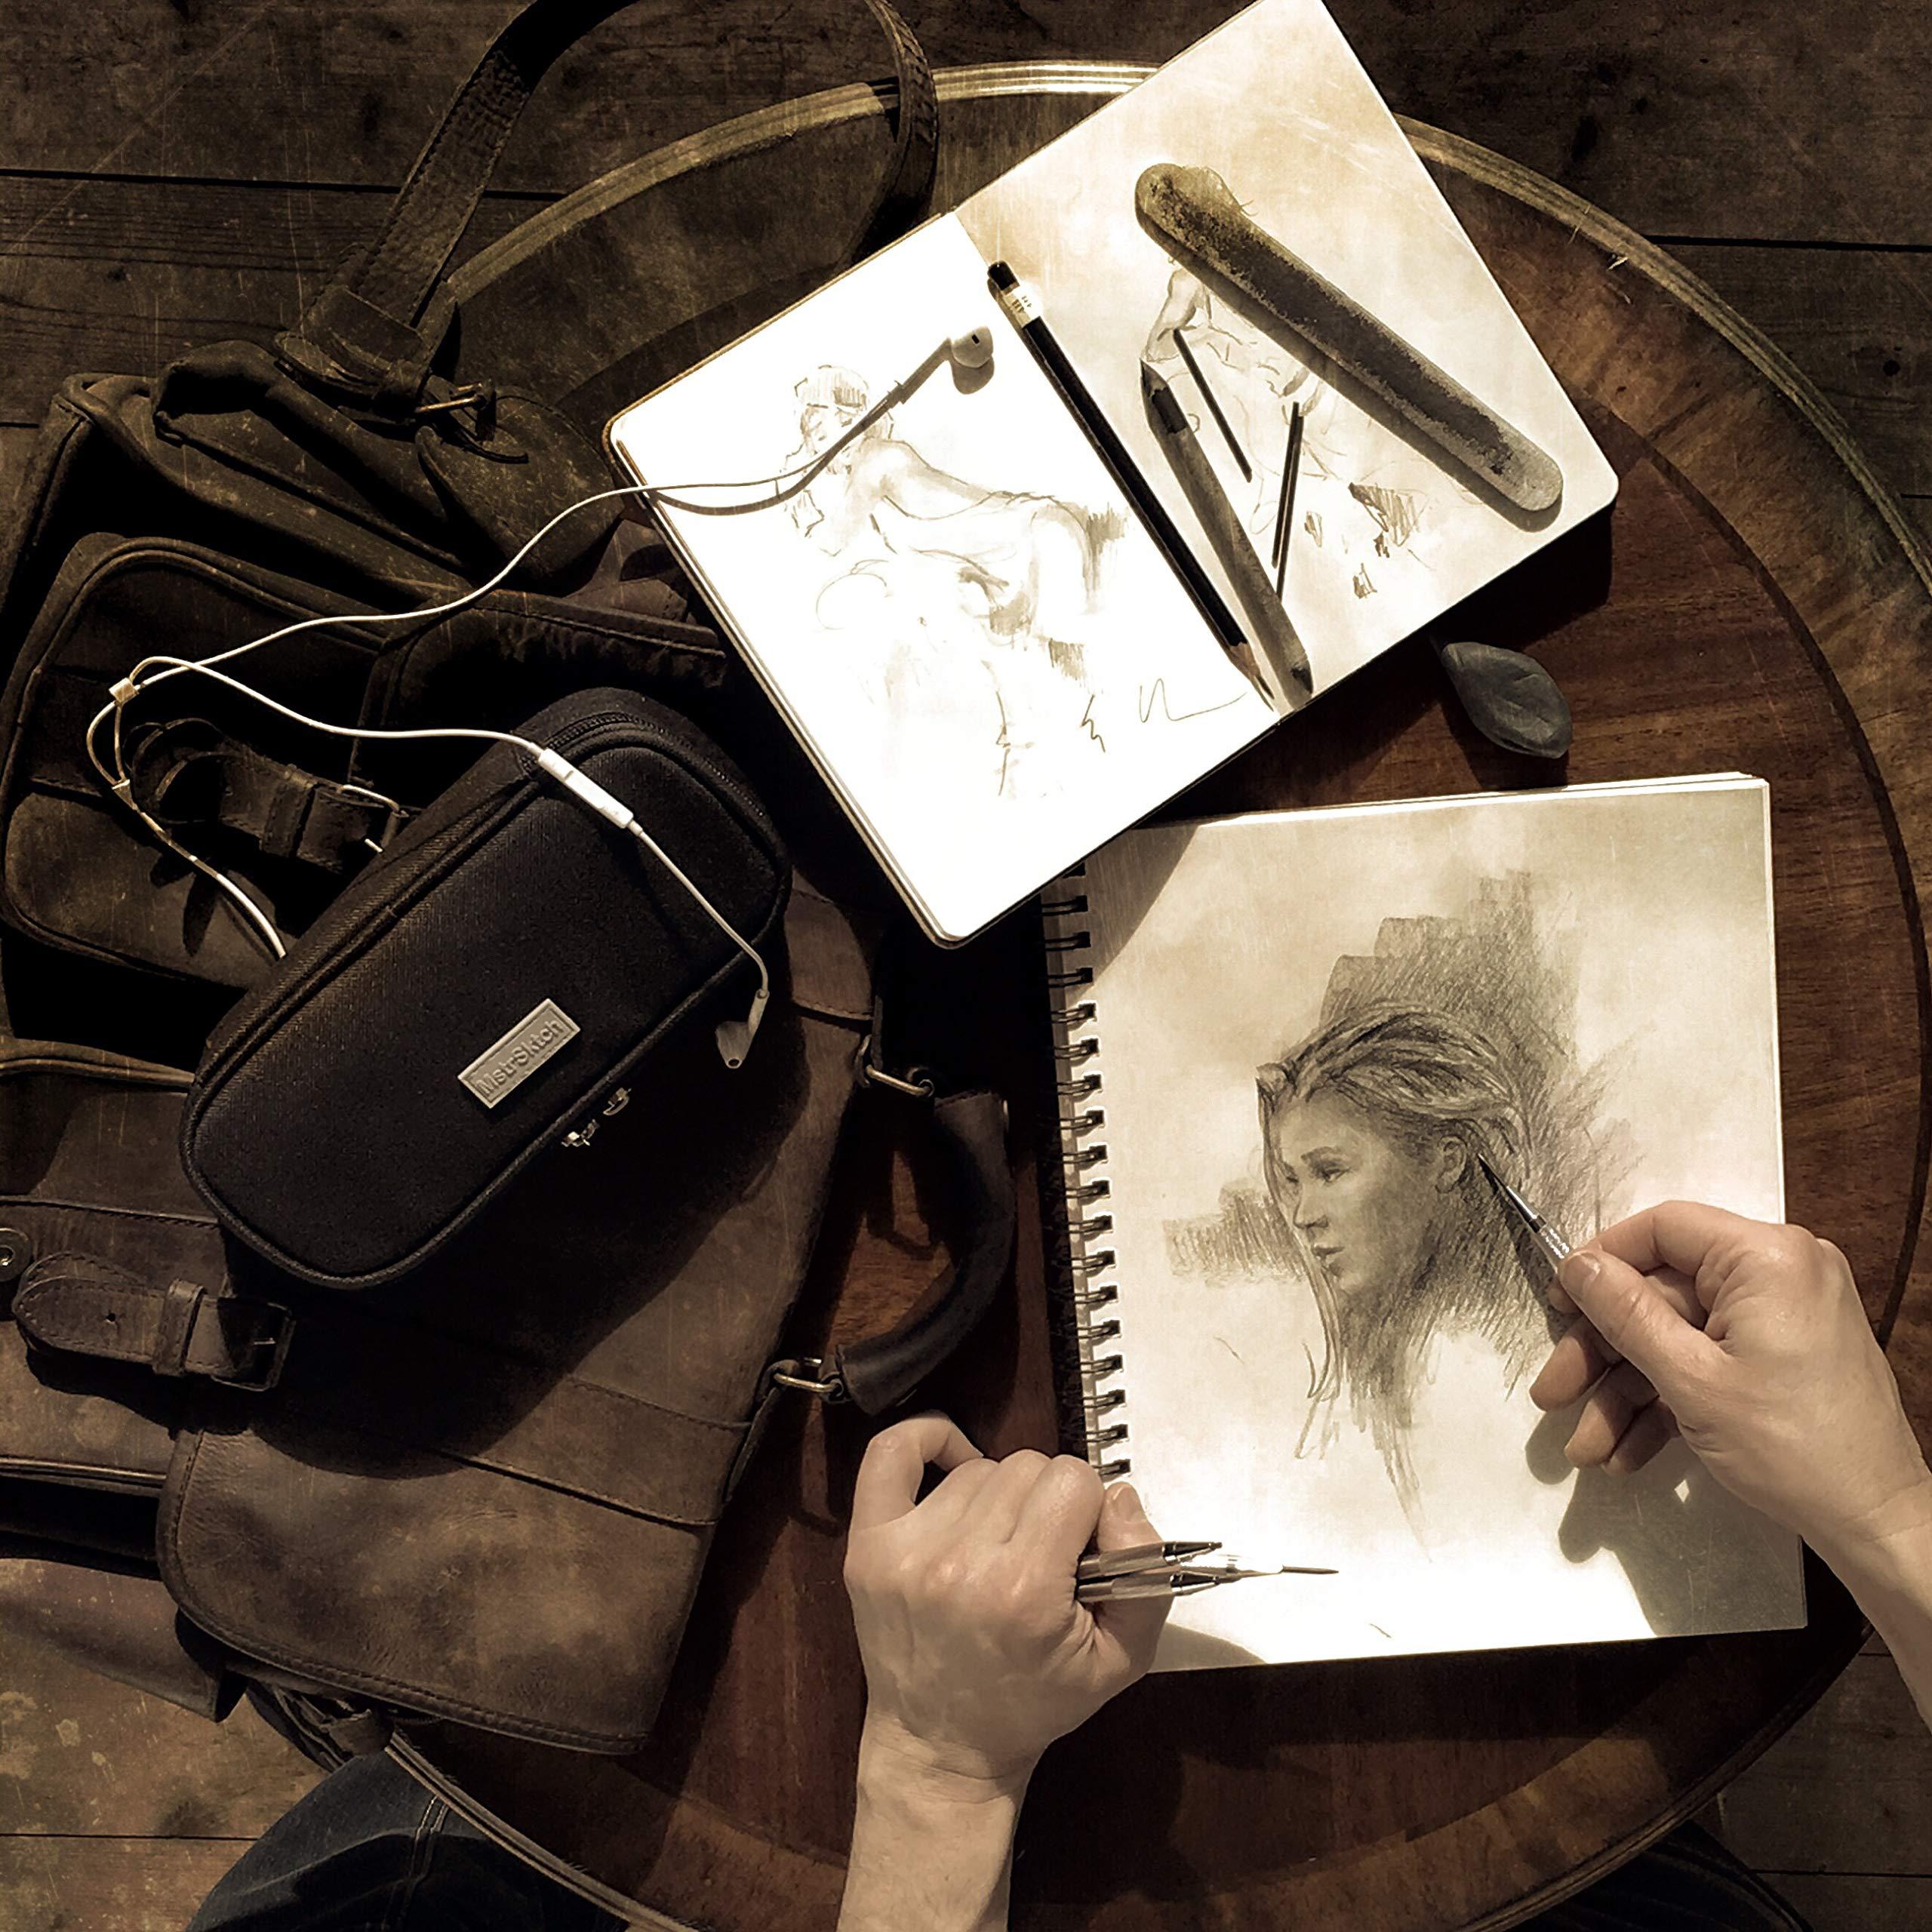 Drawing Mechanical Pencils 9-Piece | Kneaded Eraser | 2 mm Pencil Lead Refills for Artists | Travel Art Set Case | Professional Sketching & Drawing Kit | Metal Pen Barrel by MstrSktch (Image #3)